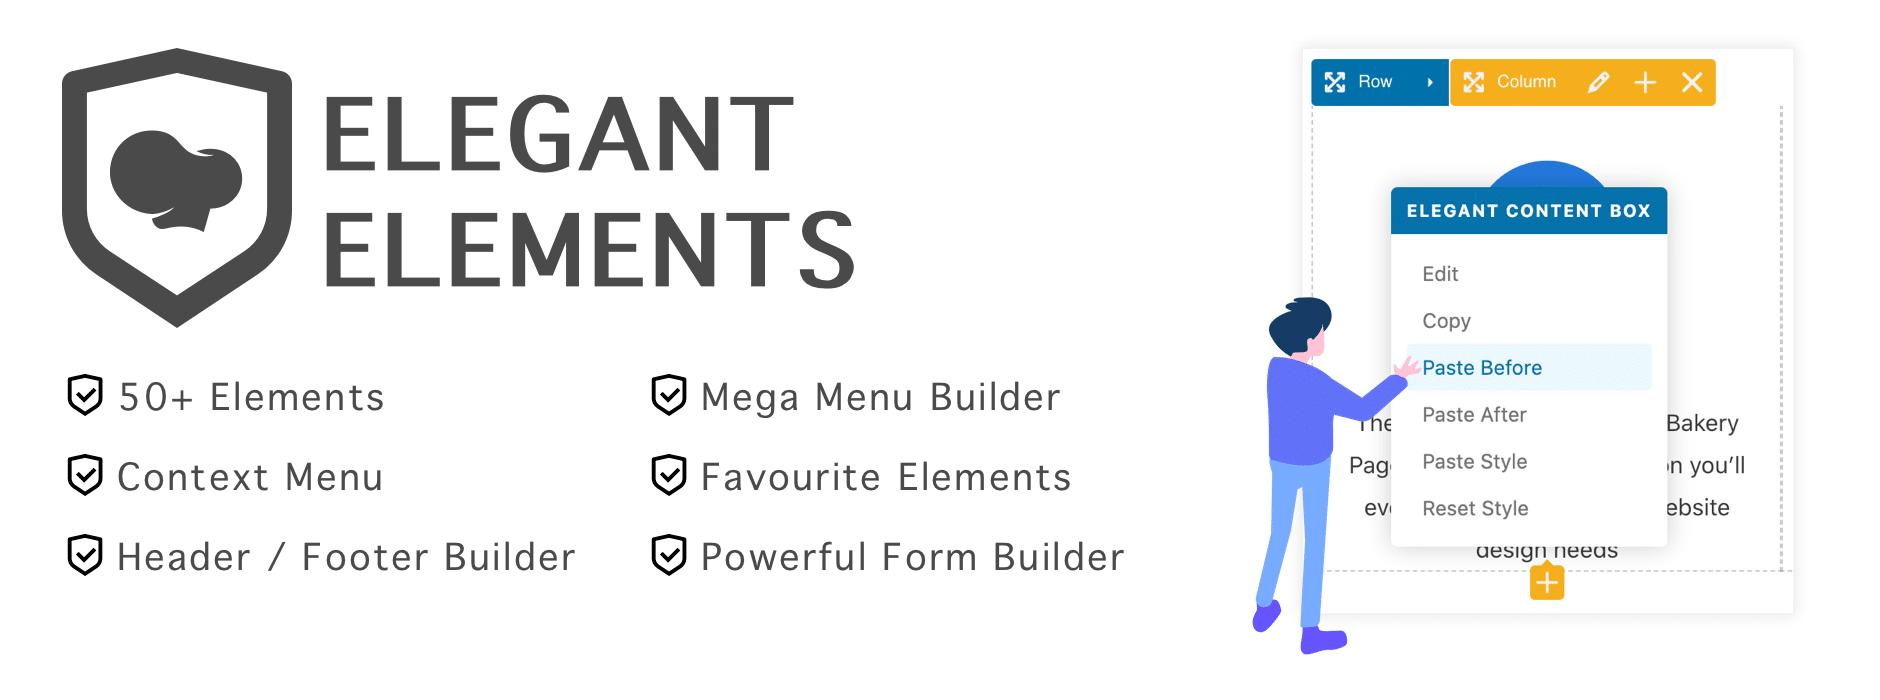 Elegant Tabs for WPBakery Page Builder - 1